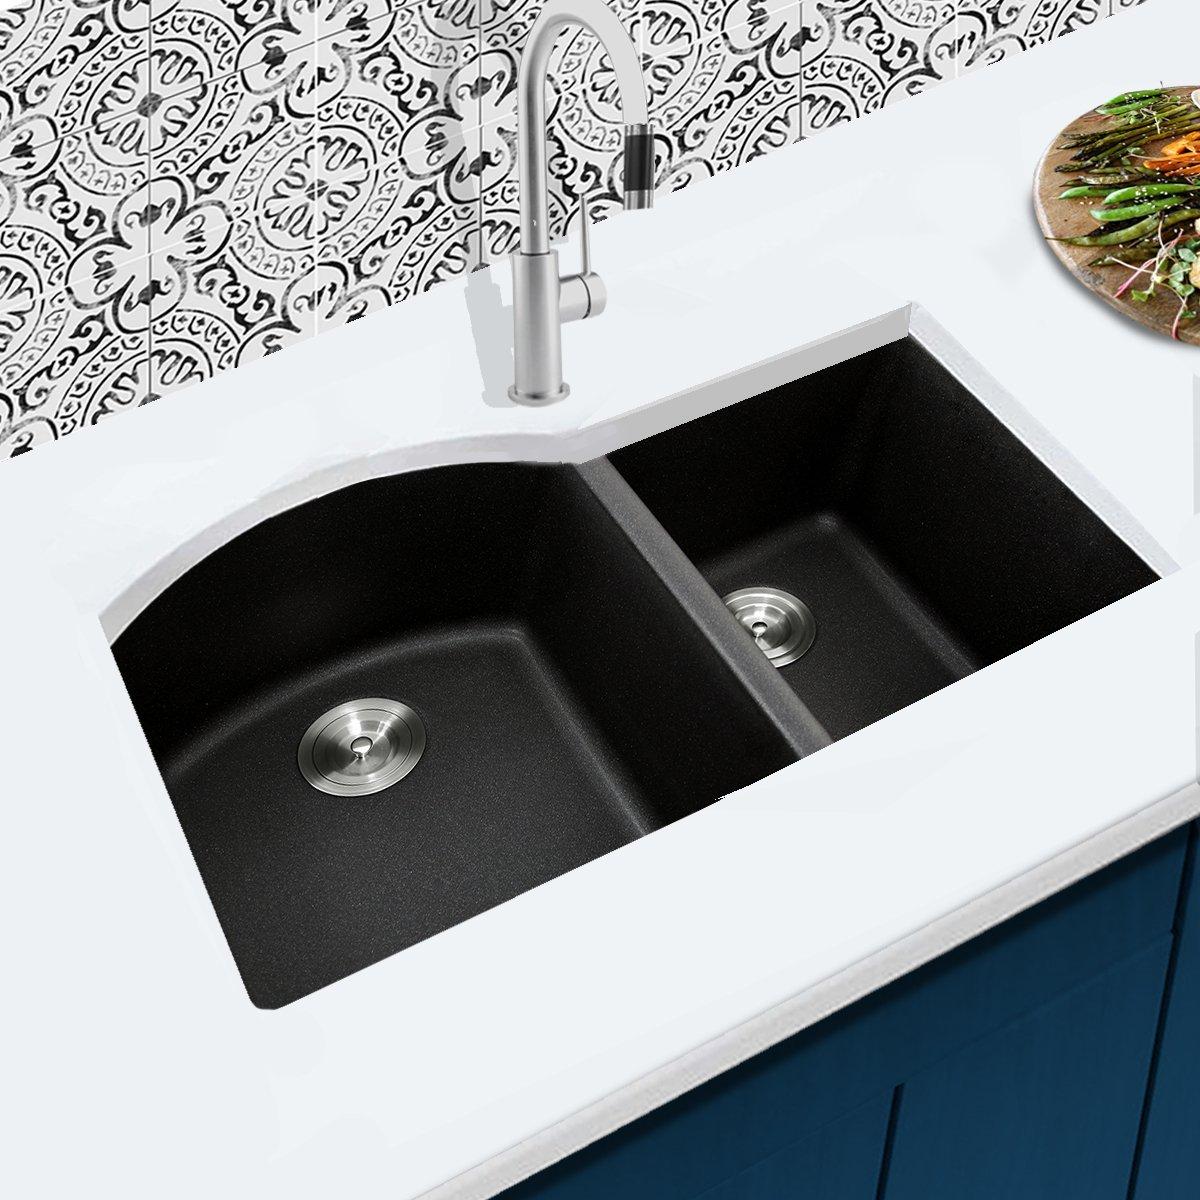 Highpoint Collection 60/40 Undermount Granite Composite Sink - Black